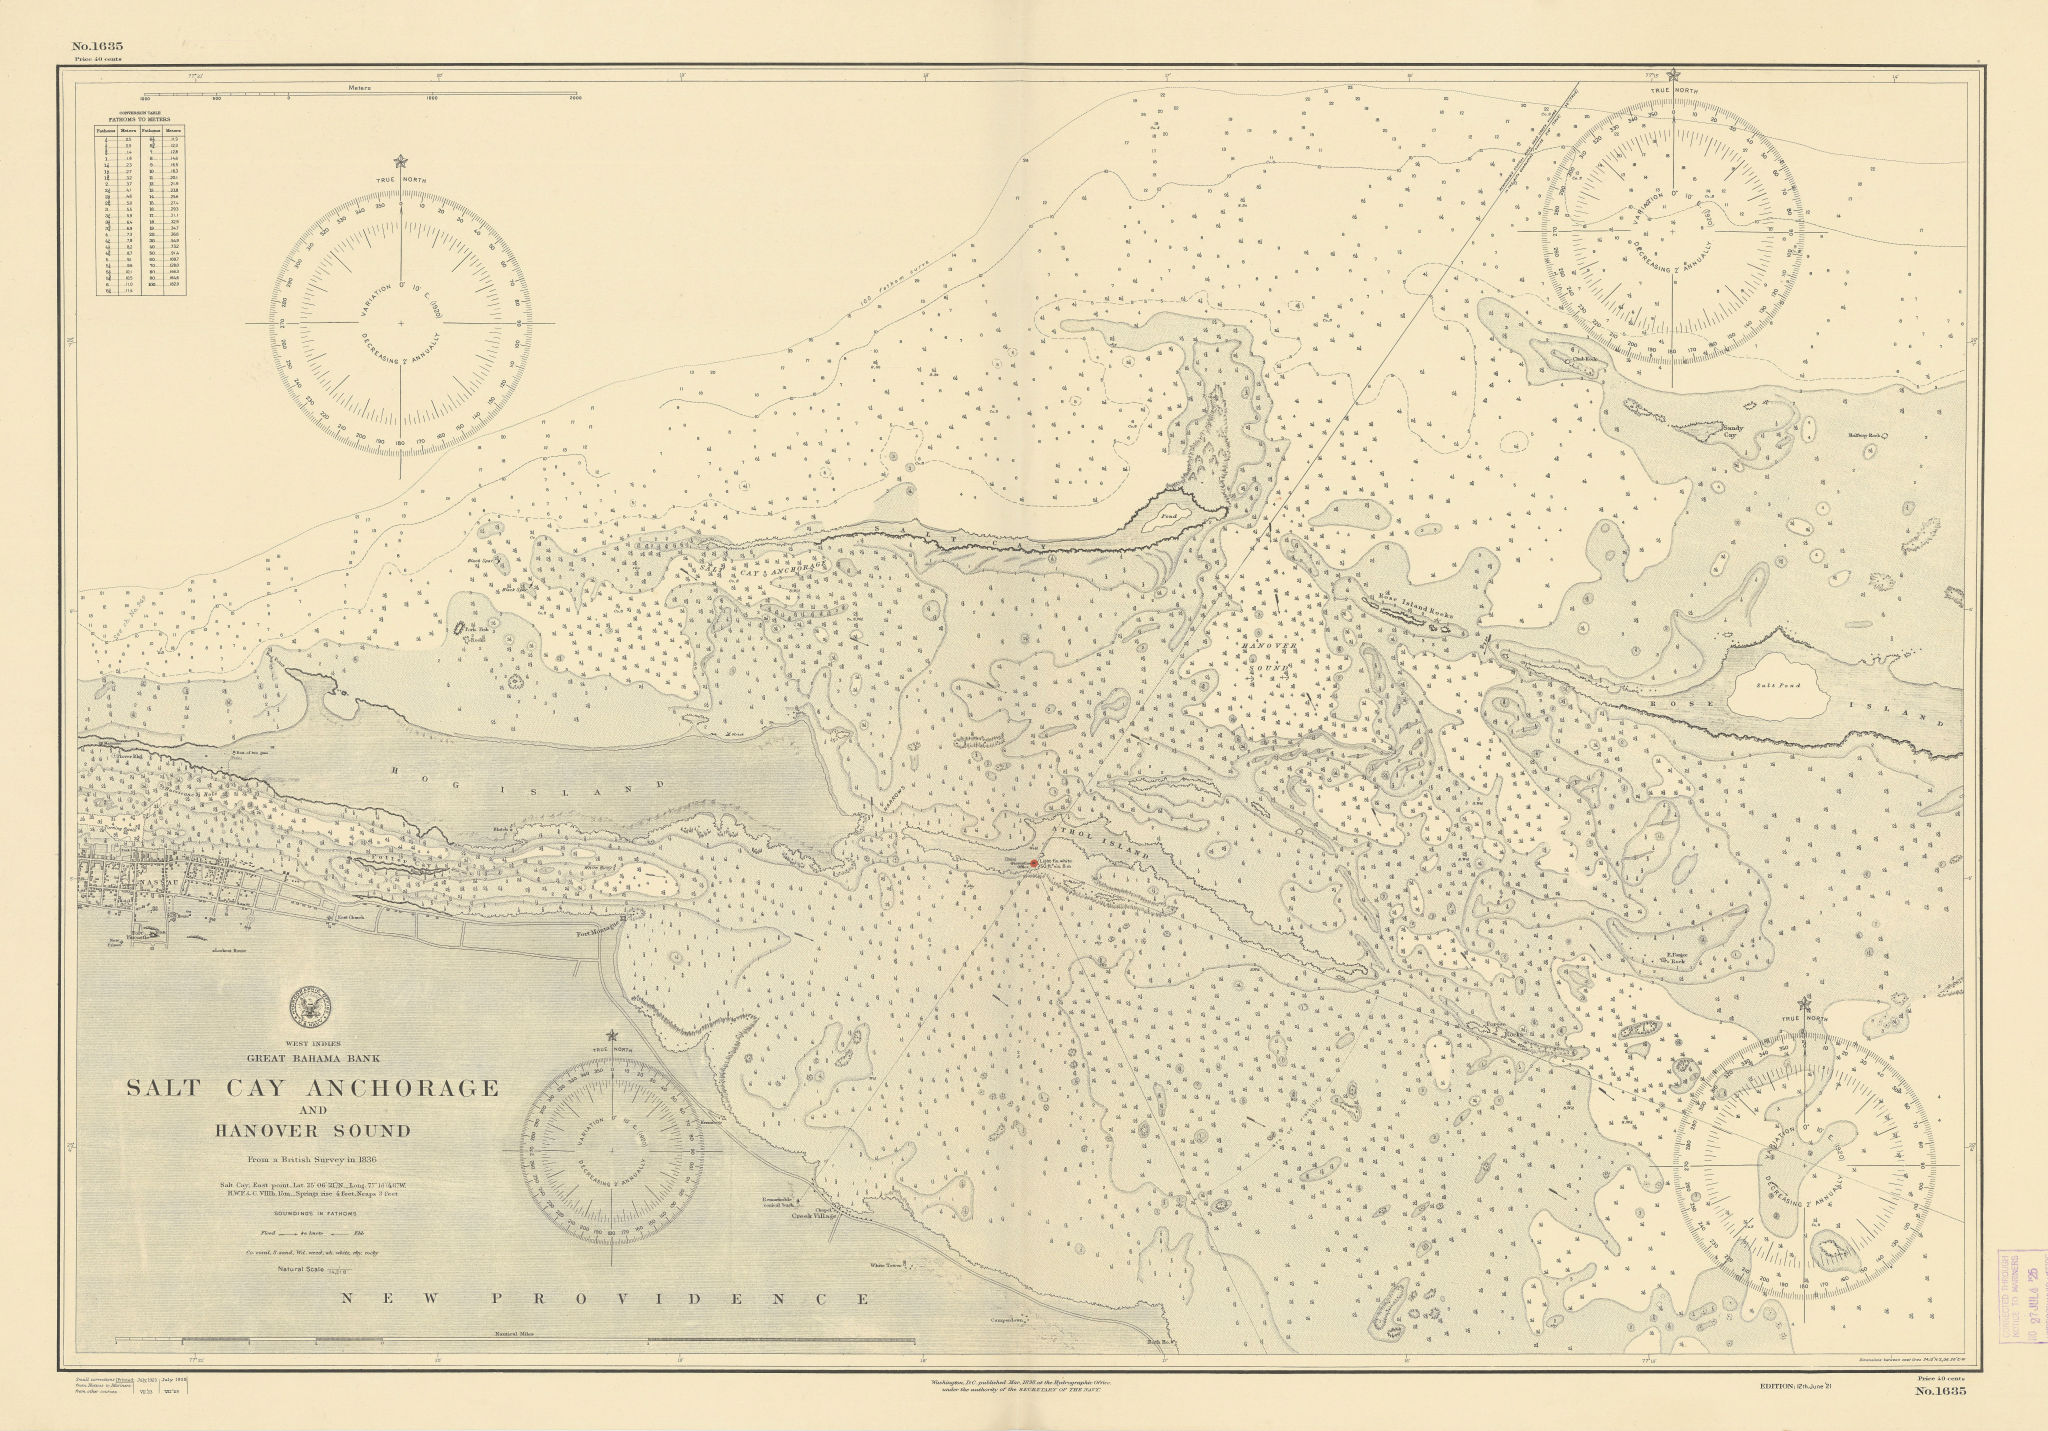 Nassau New Providence Paradise Island Bahamas. US Navy sea chart 1898 (1925) map